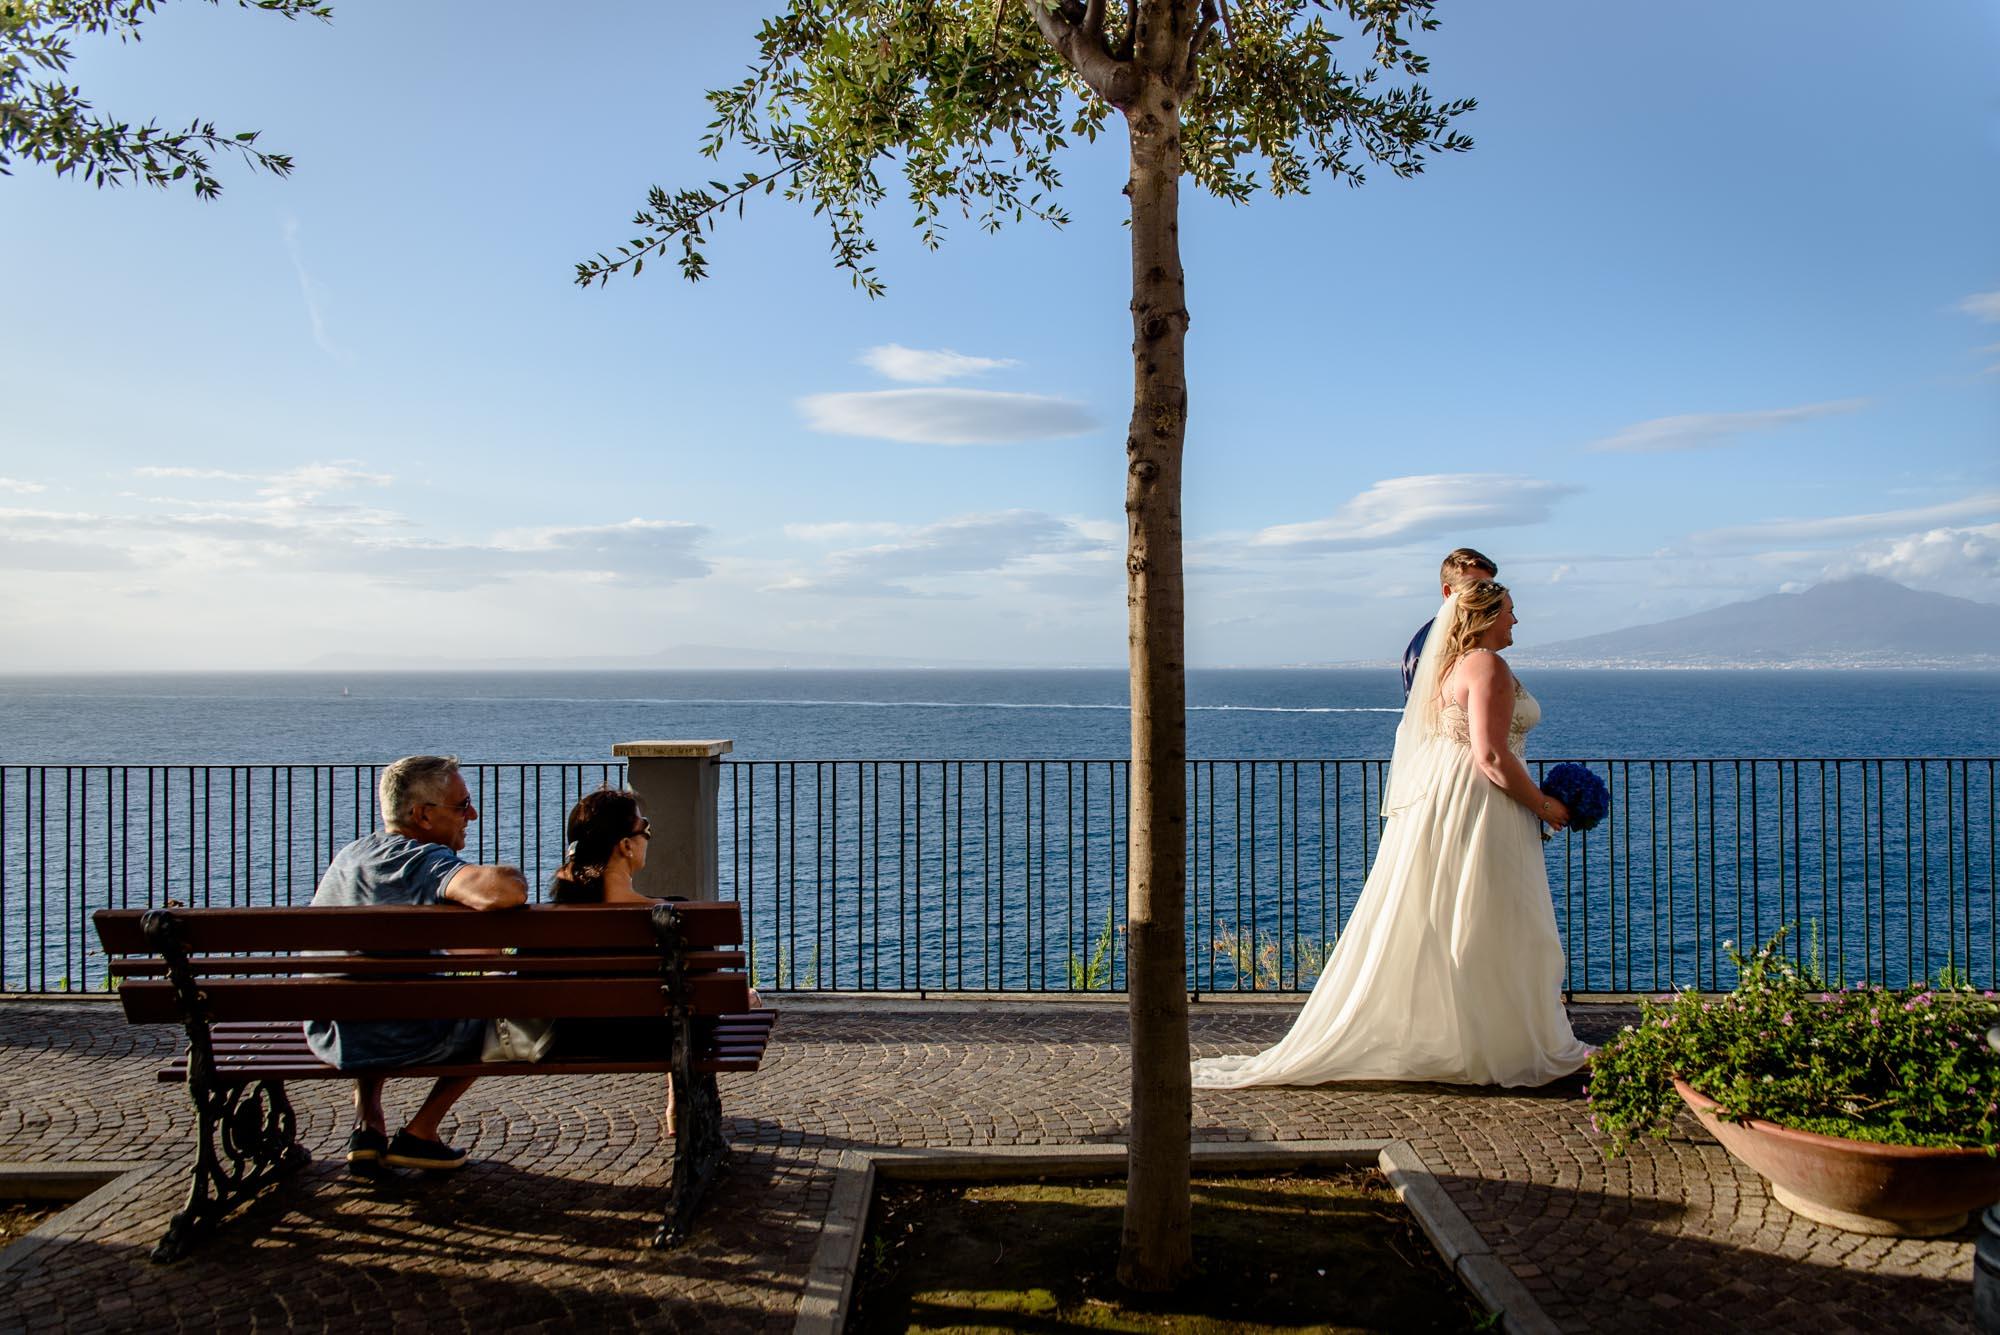 Wedding photography in Sorrento